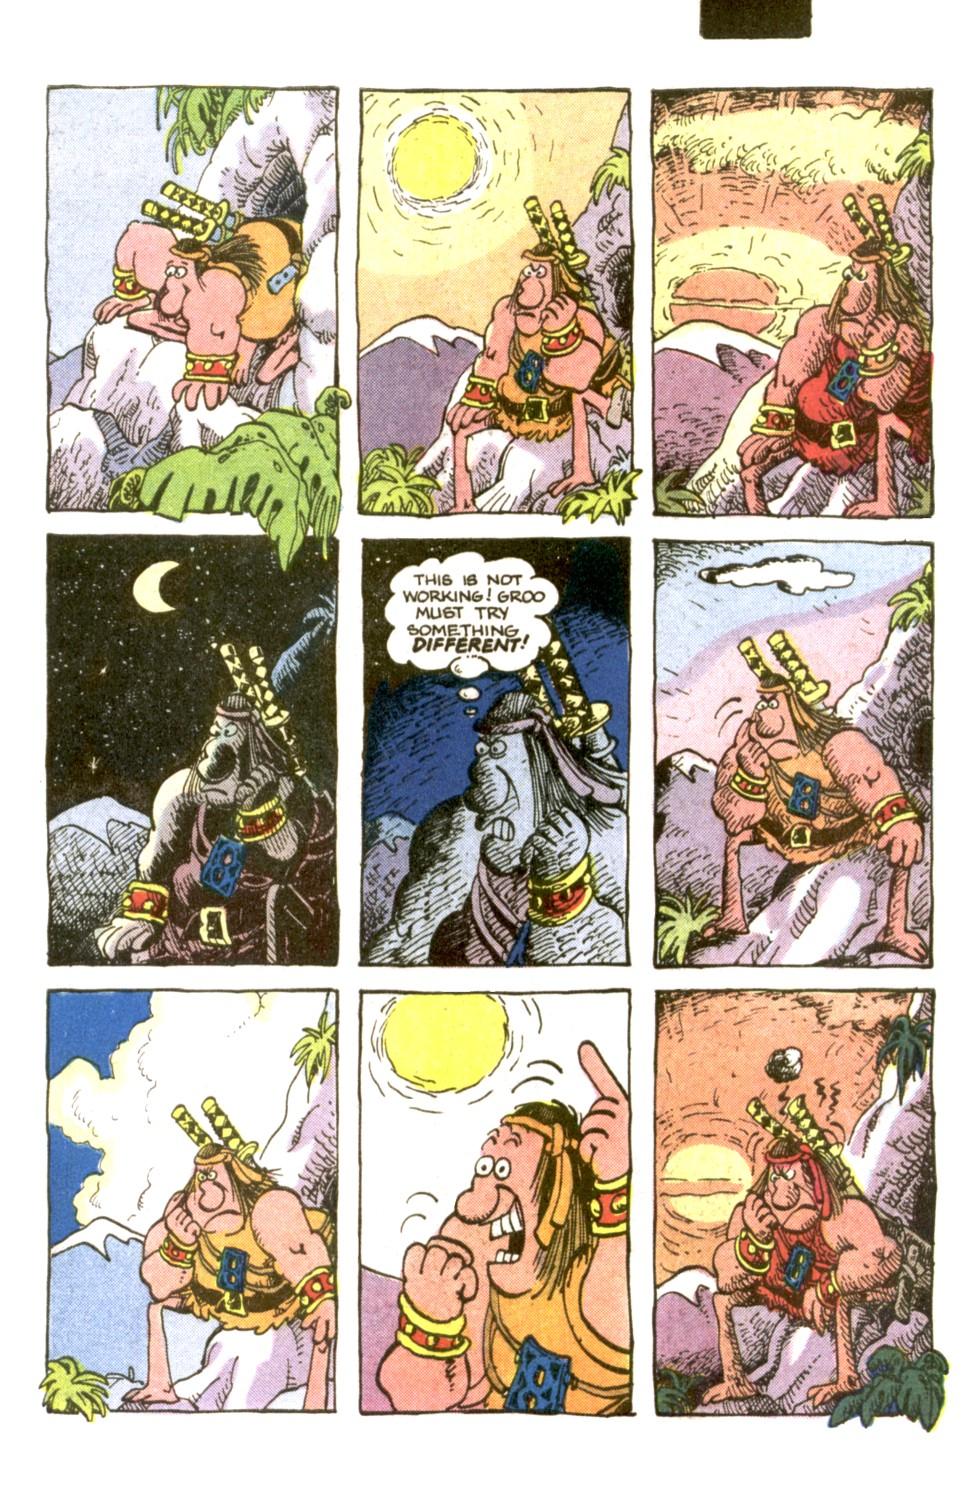 Read online Sergio Aragonés Groo the Wanderer comic -  Issue #2 - 19